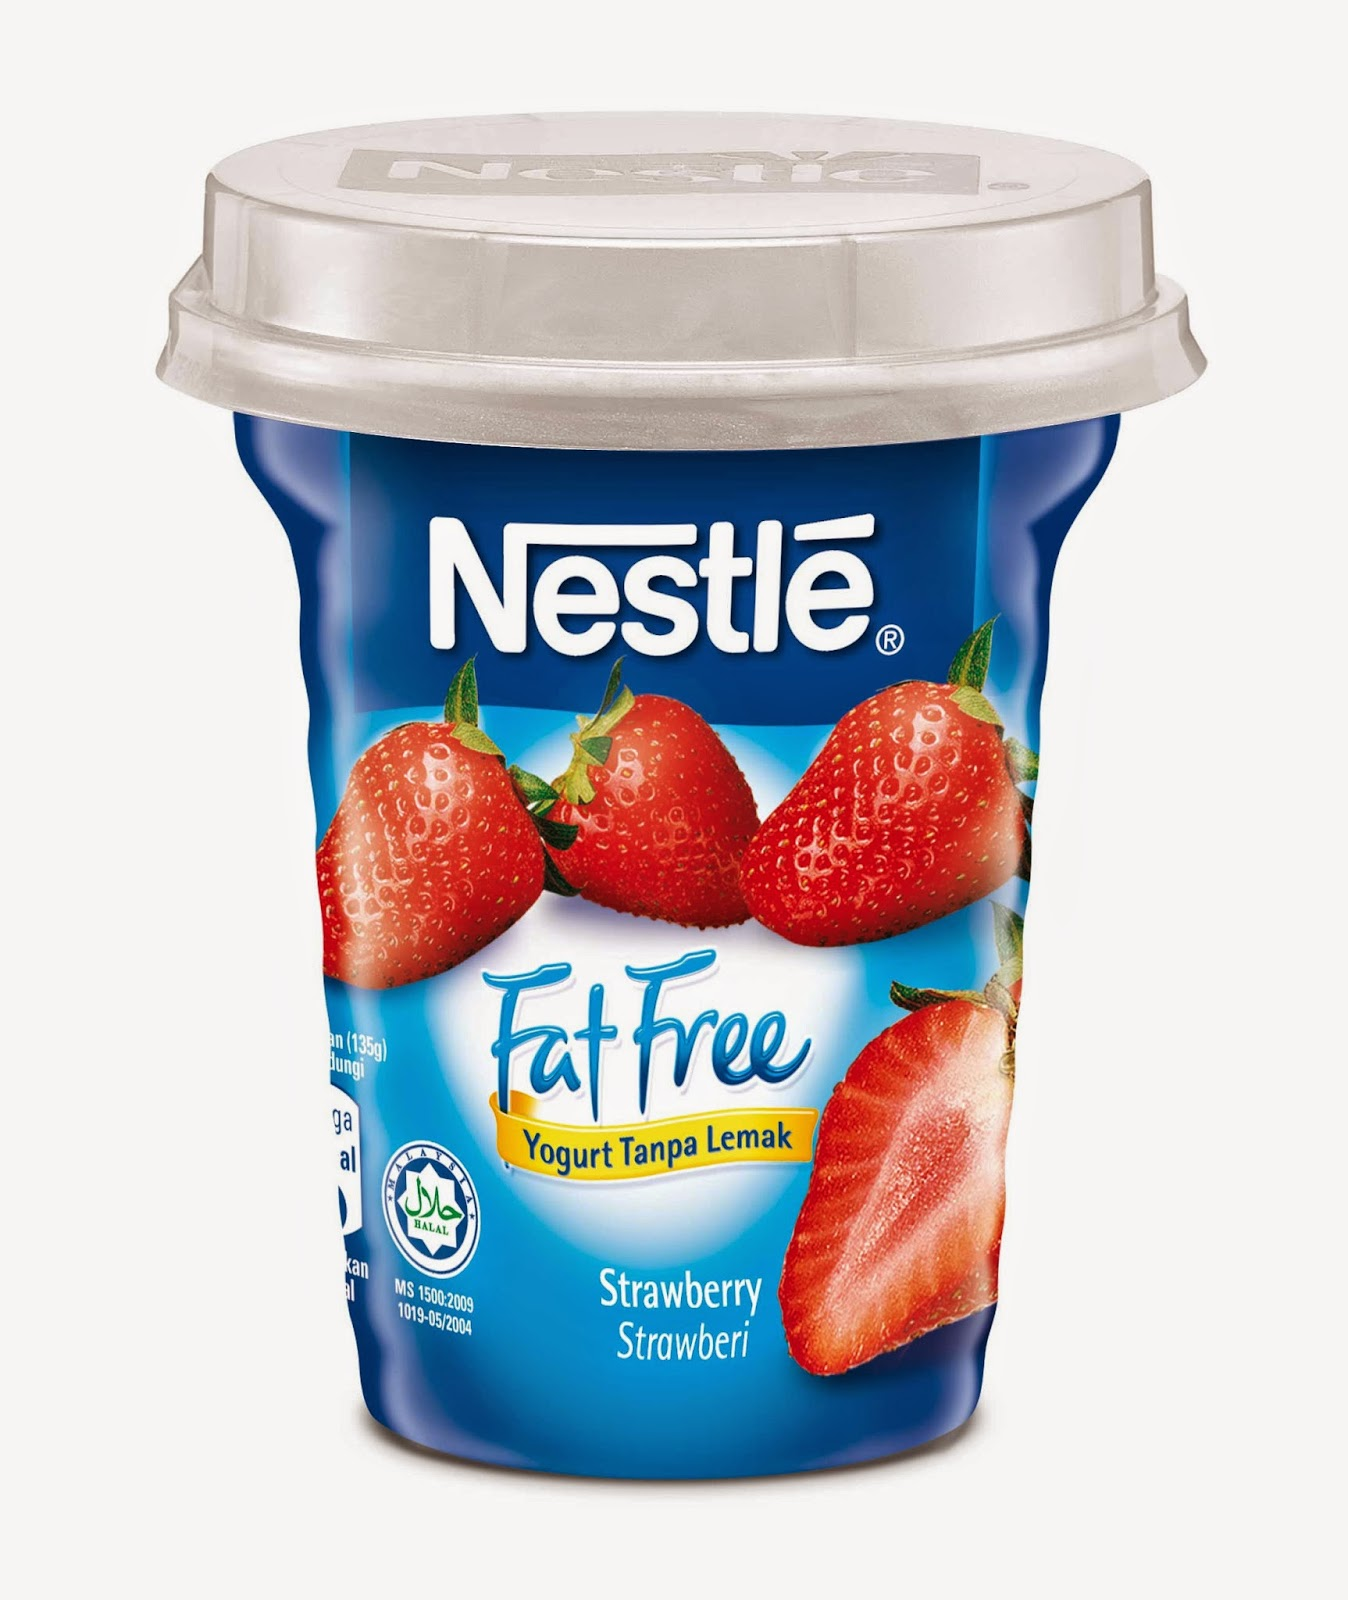 Nestle Bliss Low Fat Yogurt Drink 700g Strawberry: Nestle Bliss Supermarket Sweep Is Back!